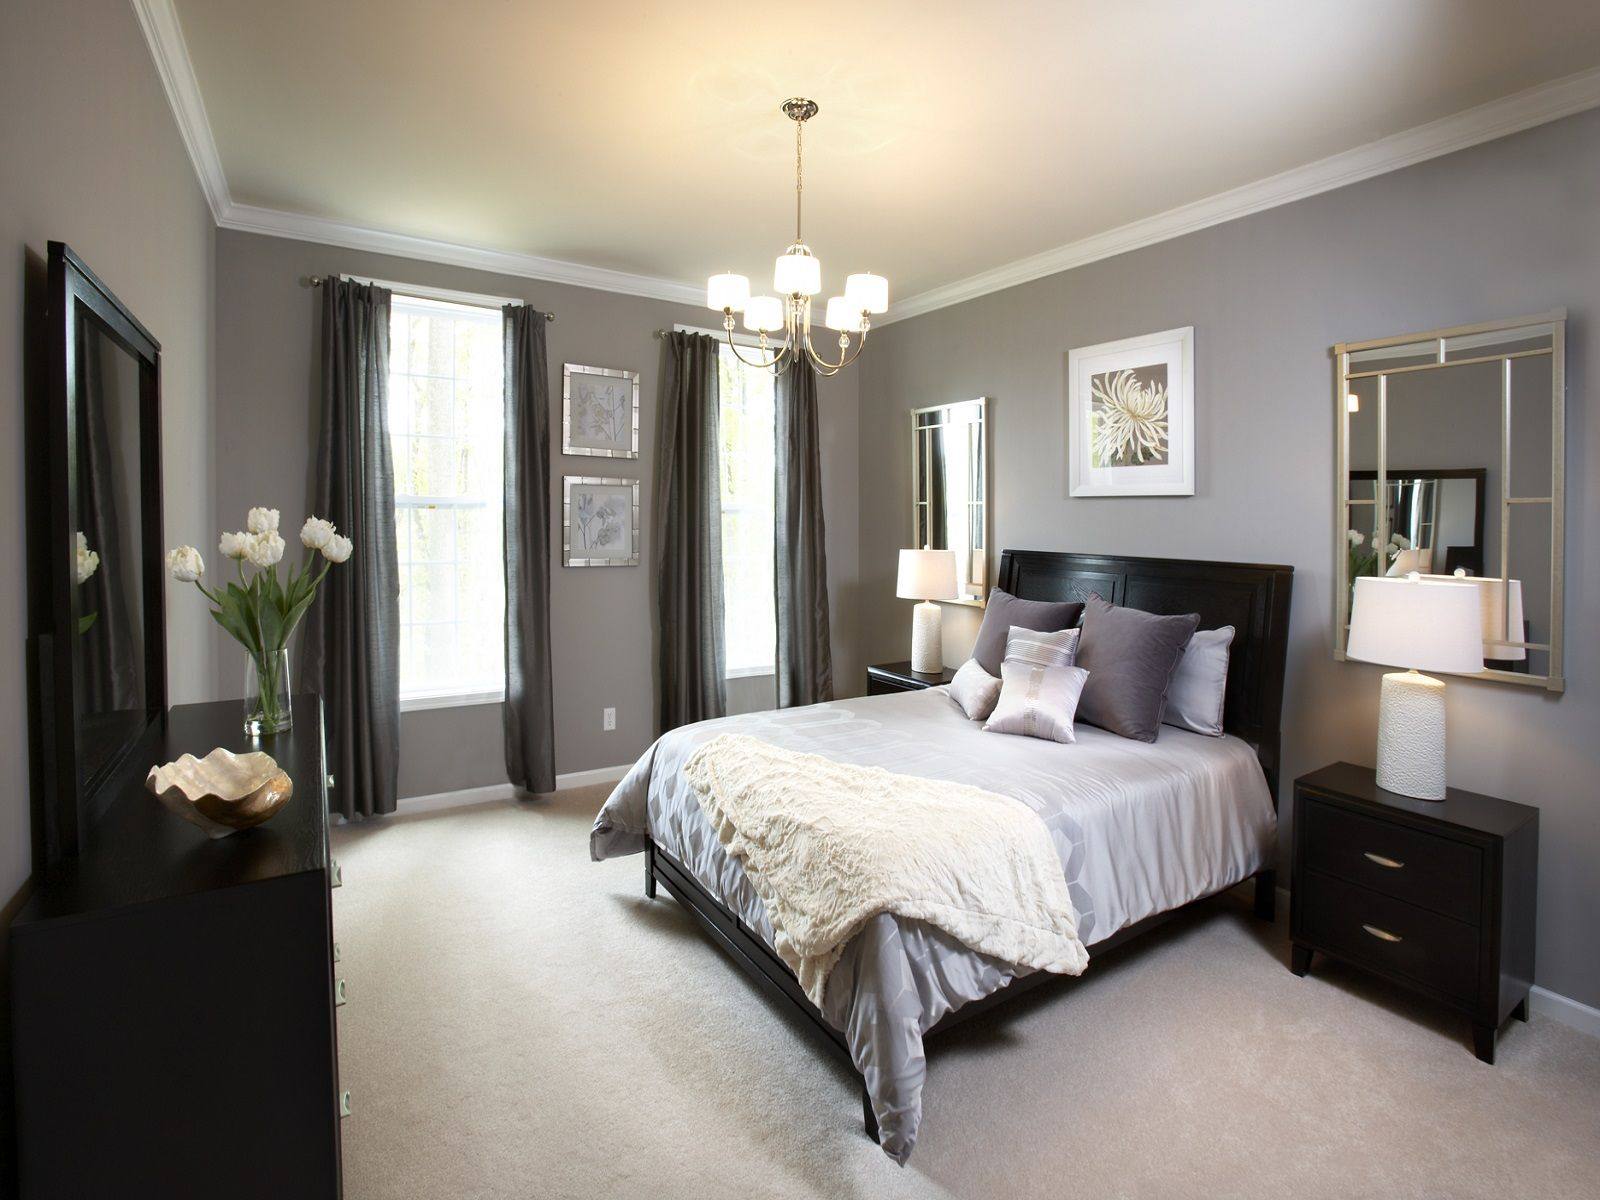 Master bedroom headboard design ideas  BedroomPaint Color Ideas For Master Bedroom Buffet With Mirror